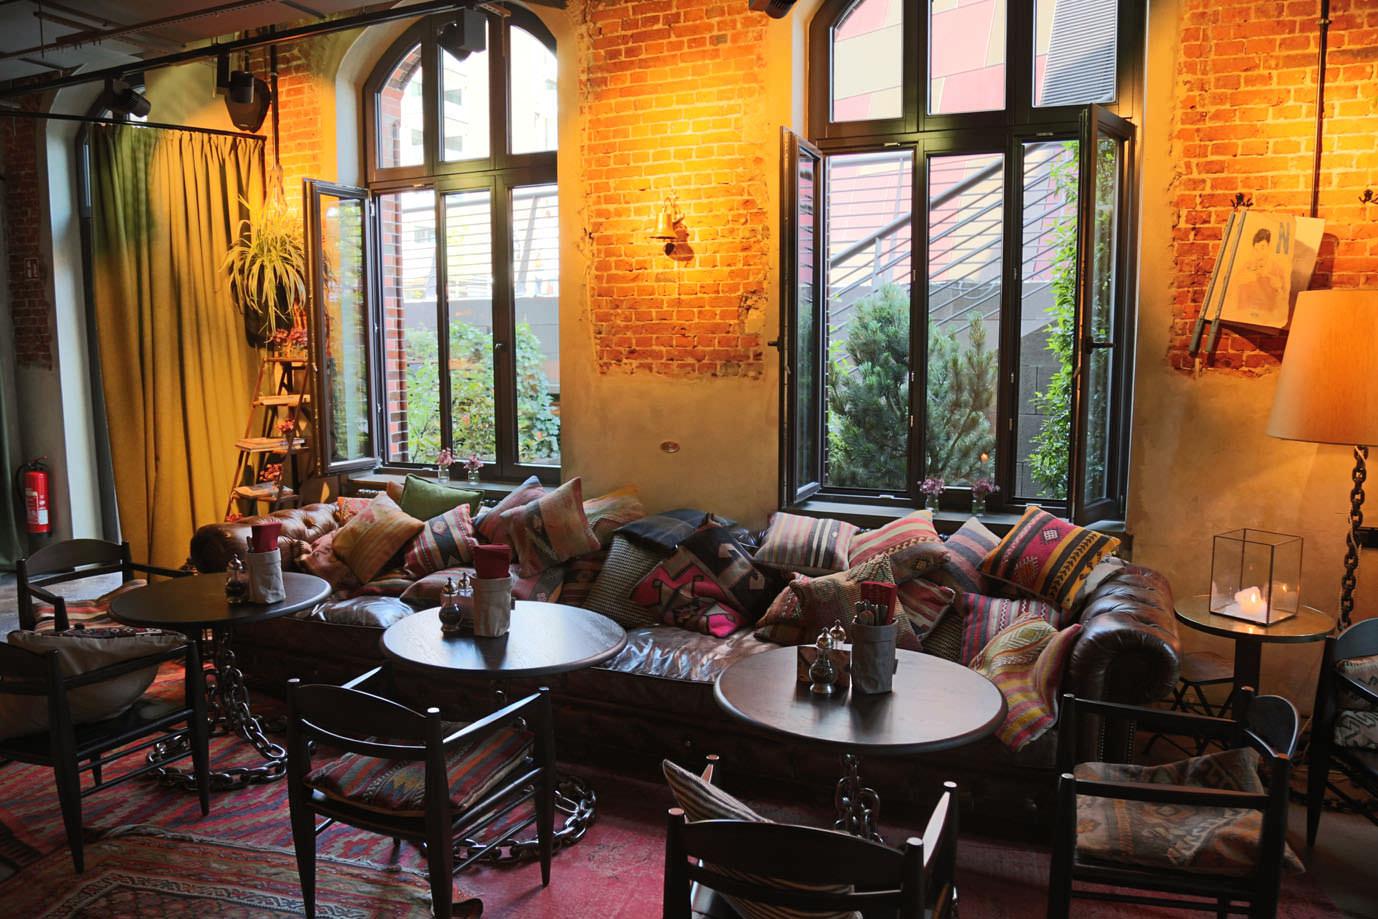 wellness im neuen 25hours hotel hamburg altes hafenamt. Black Bedroom Furniture Sets. Home Design Ideas